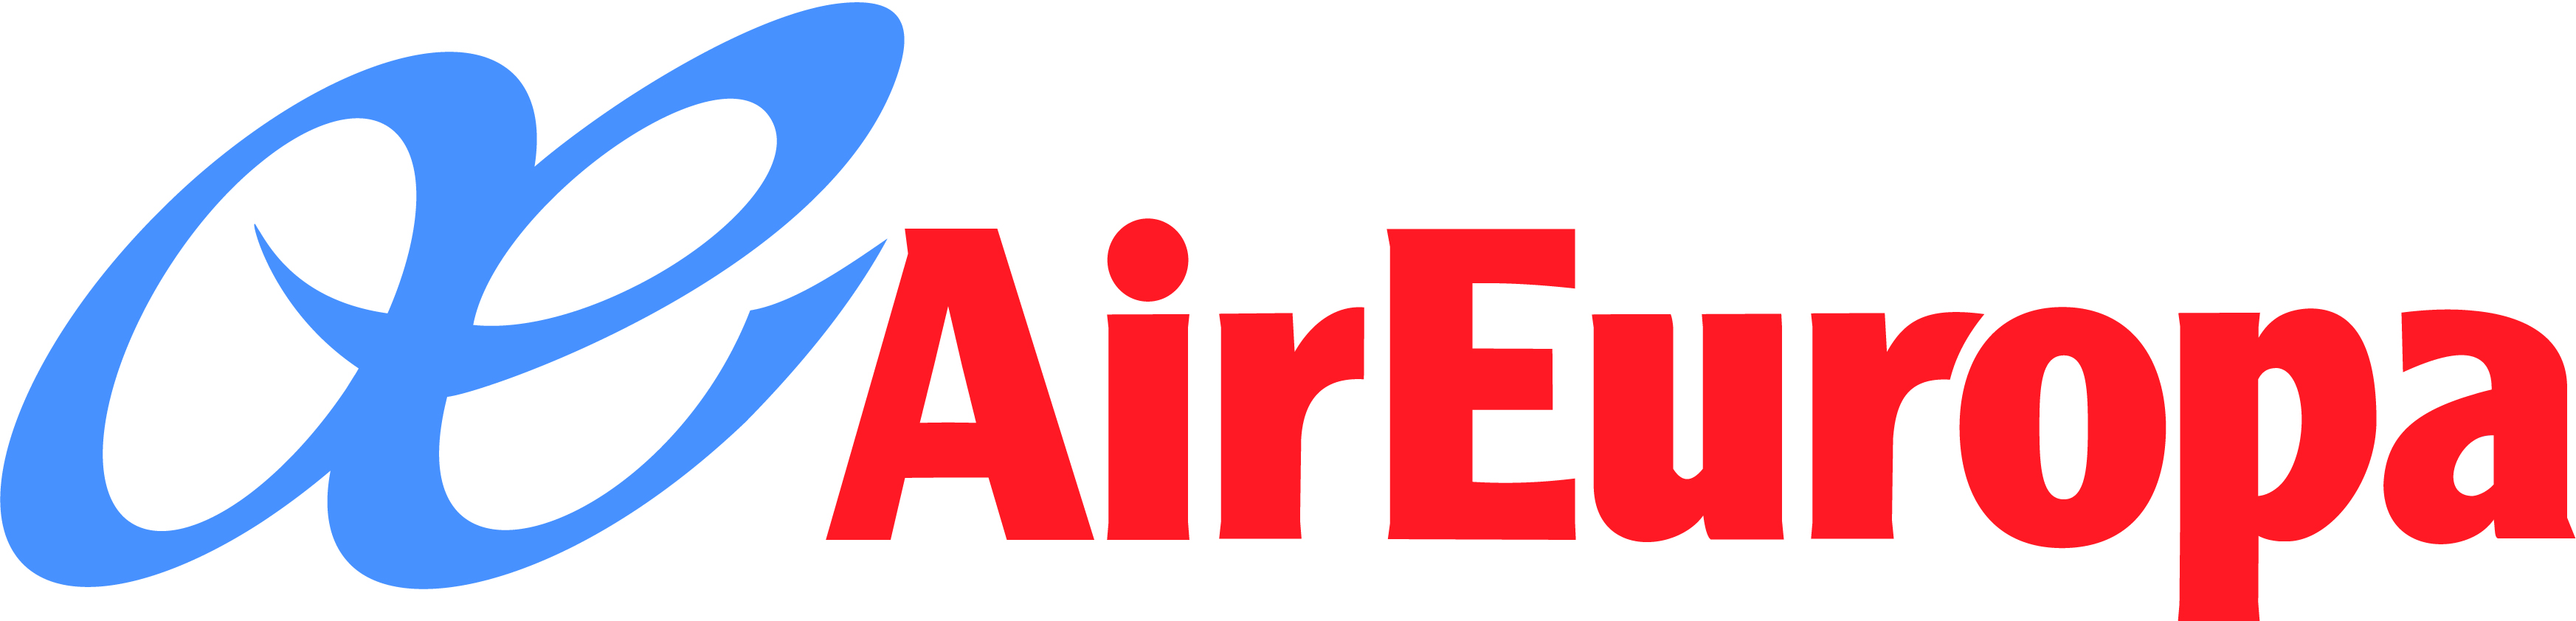 Air Europa Logo Wallpaper